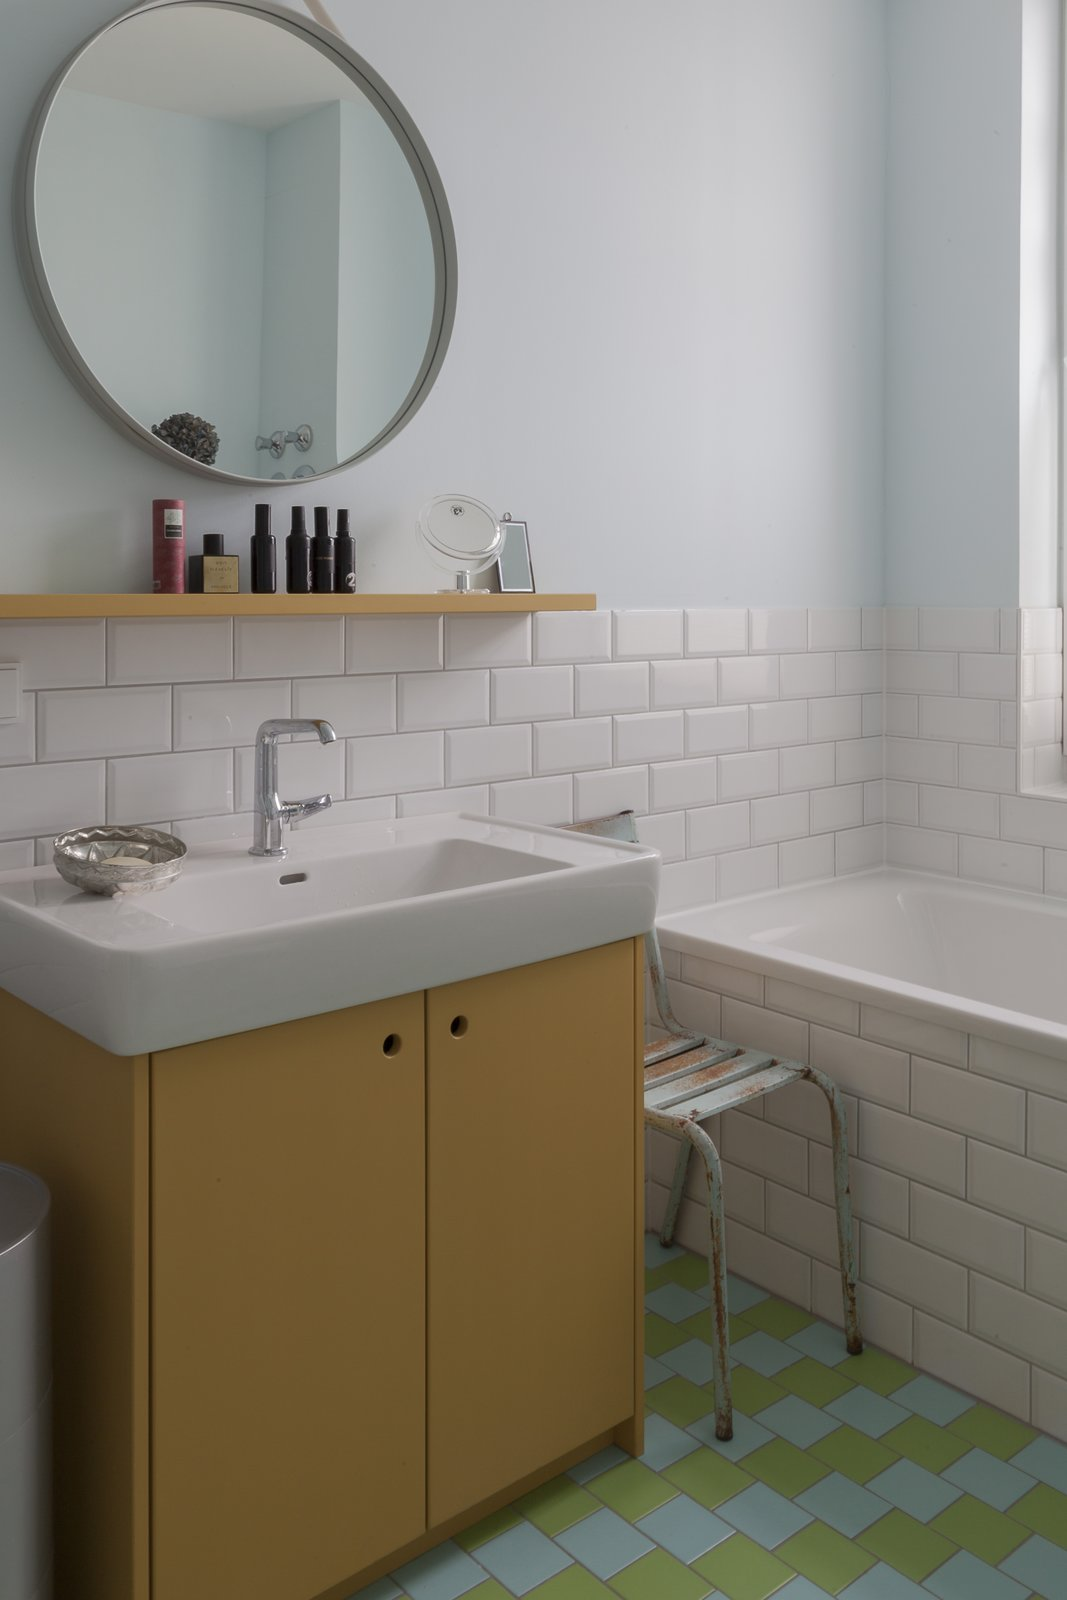 24 Hours Berlin penthouse bathroom